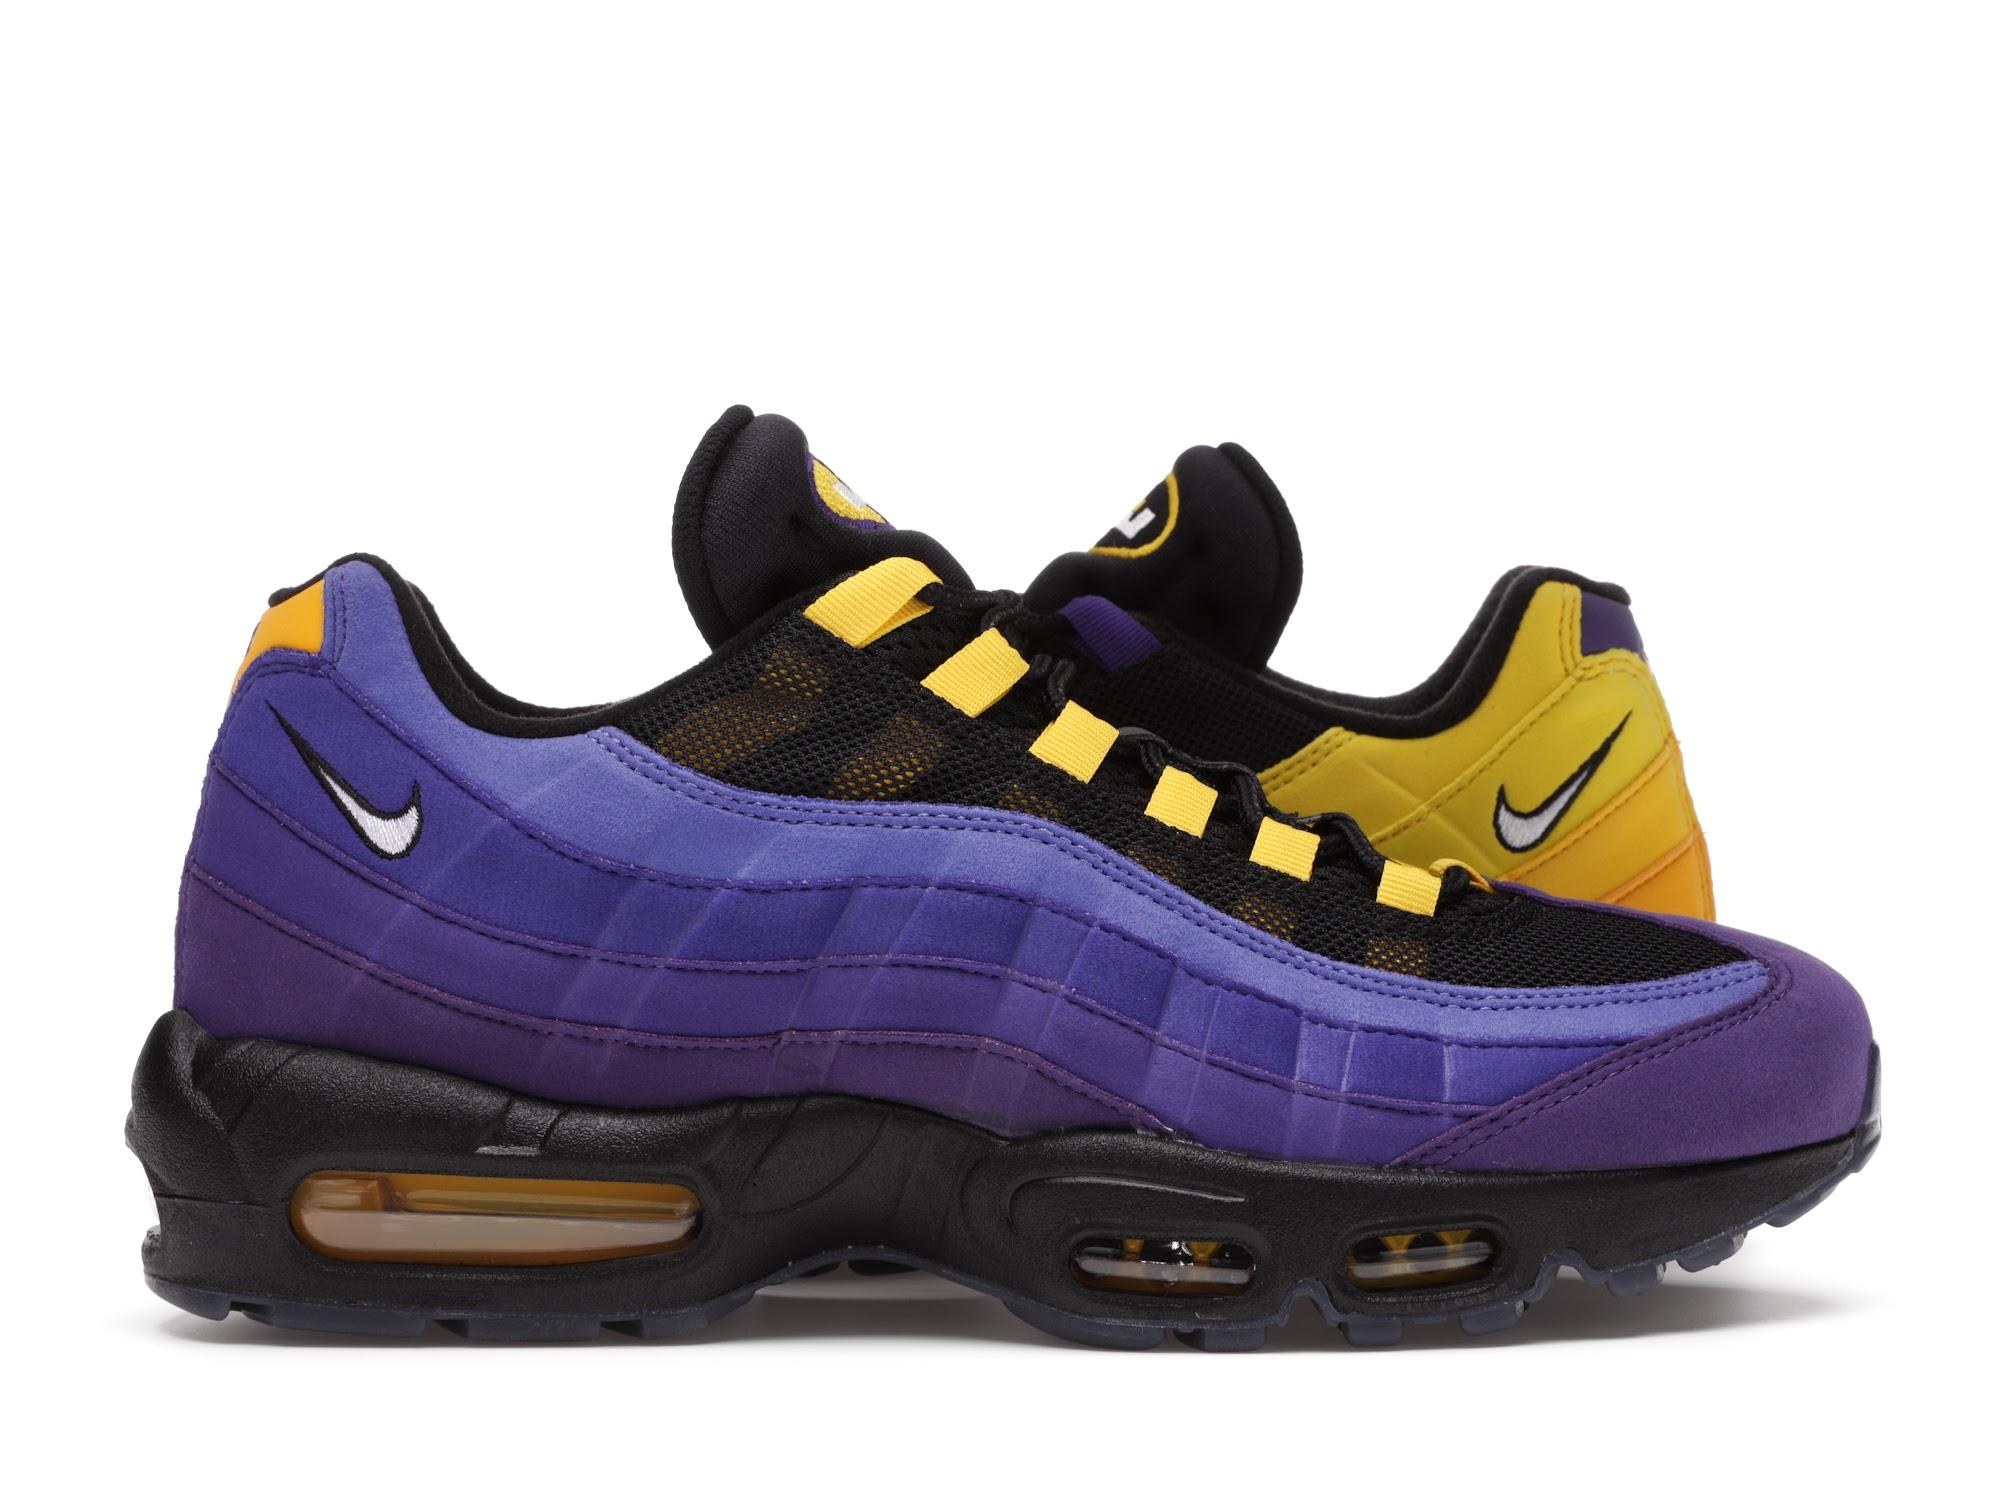 Nike Air Max 95 NRG LeBron Lakers